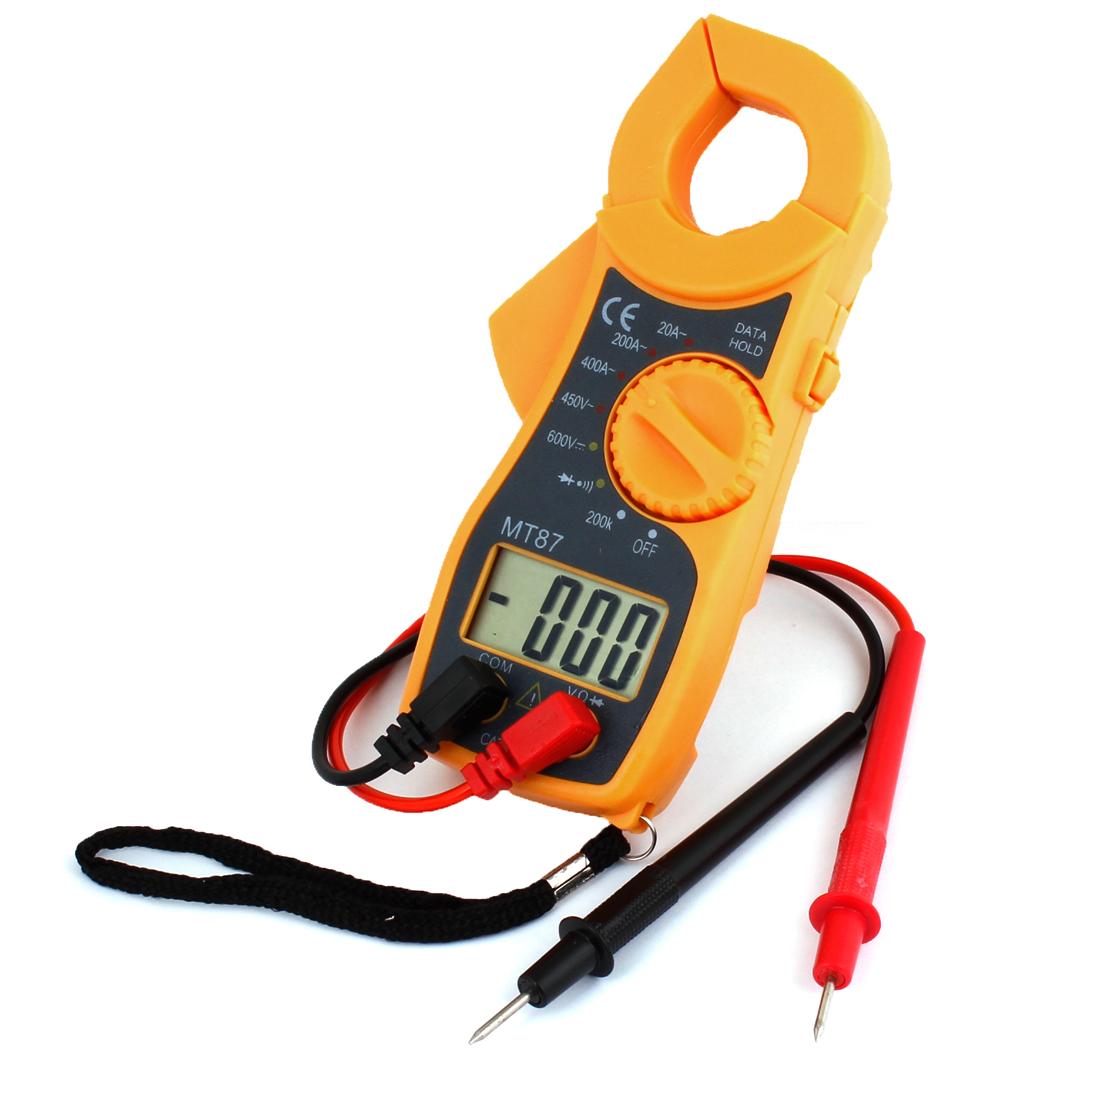 MT87 Multitester Digital Multimeter Ohm AC DC Voltmeter w Test Leads